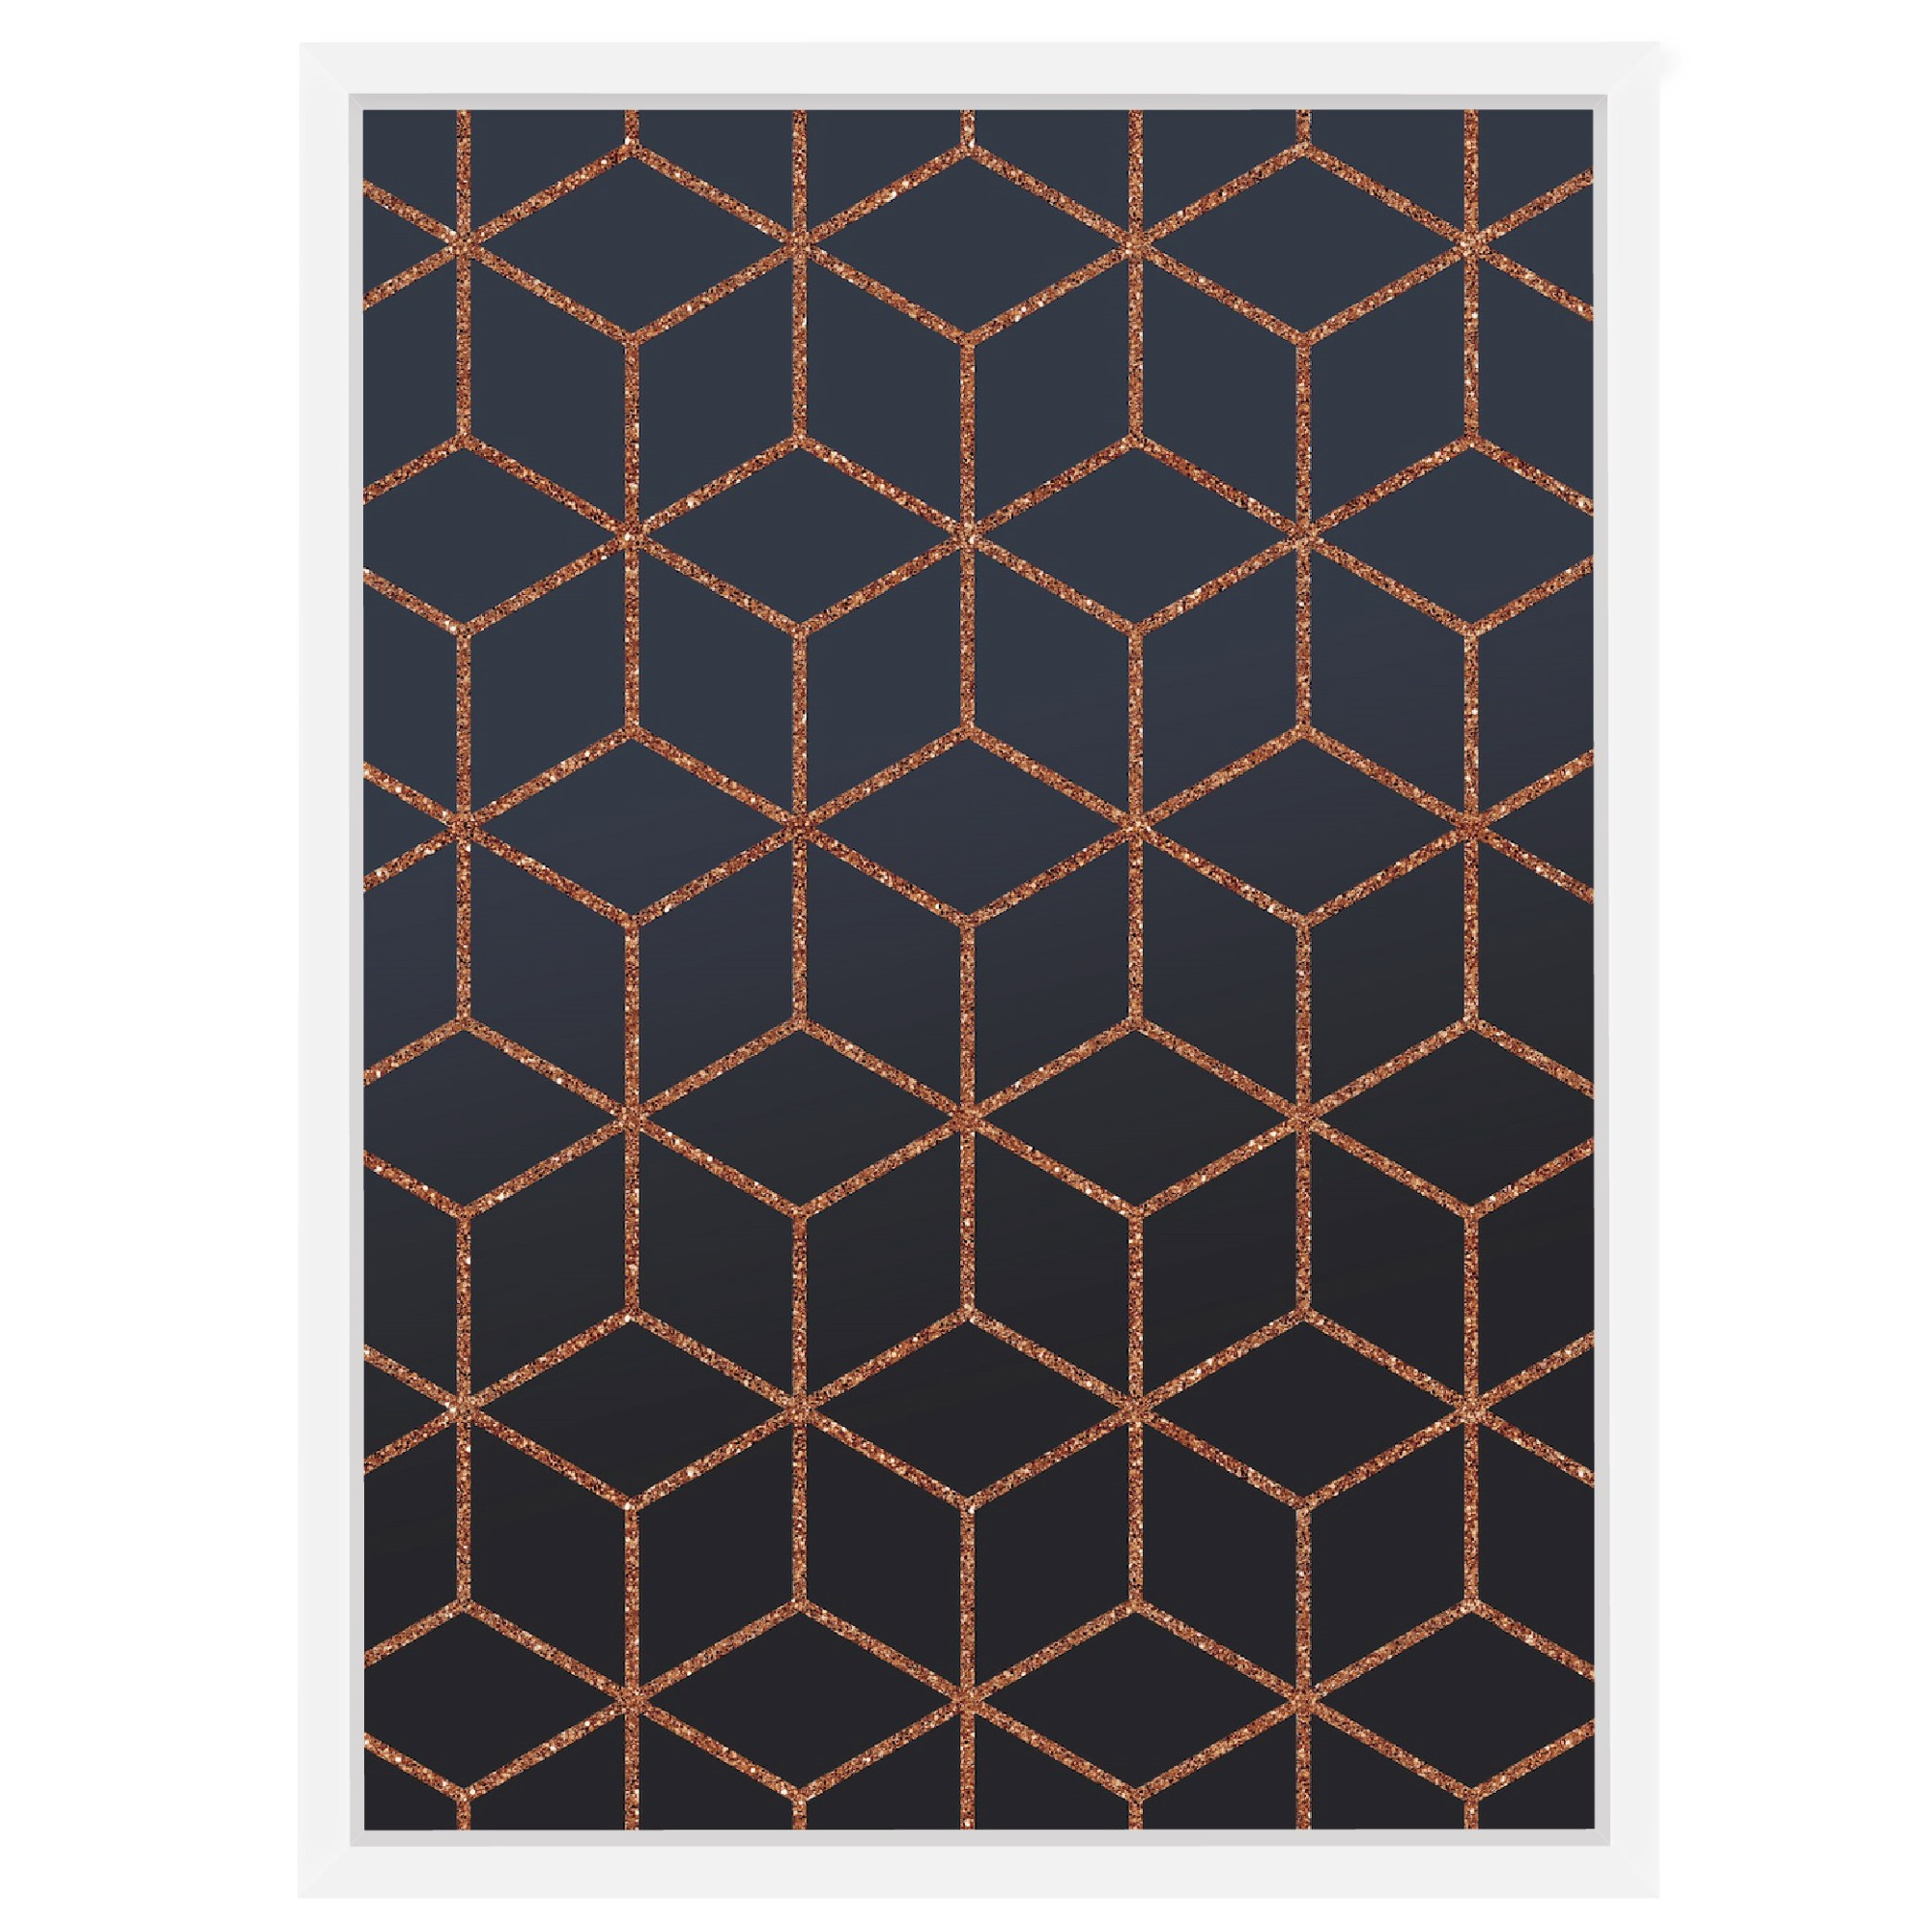 Quadro Decorativo 53x73 cm Geometrico 540994 - Euroquadros